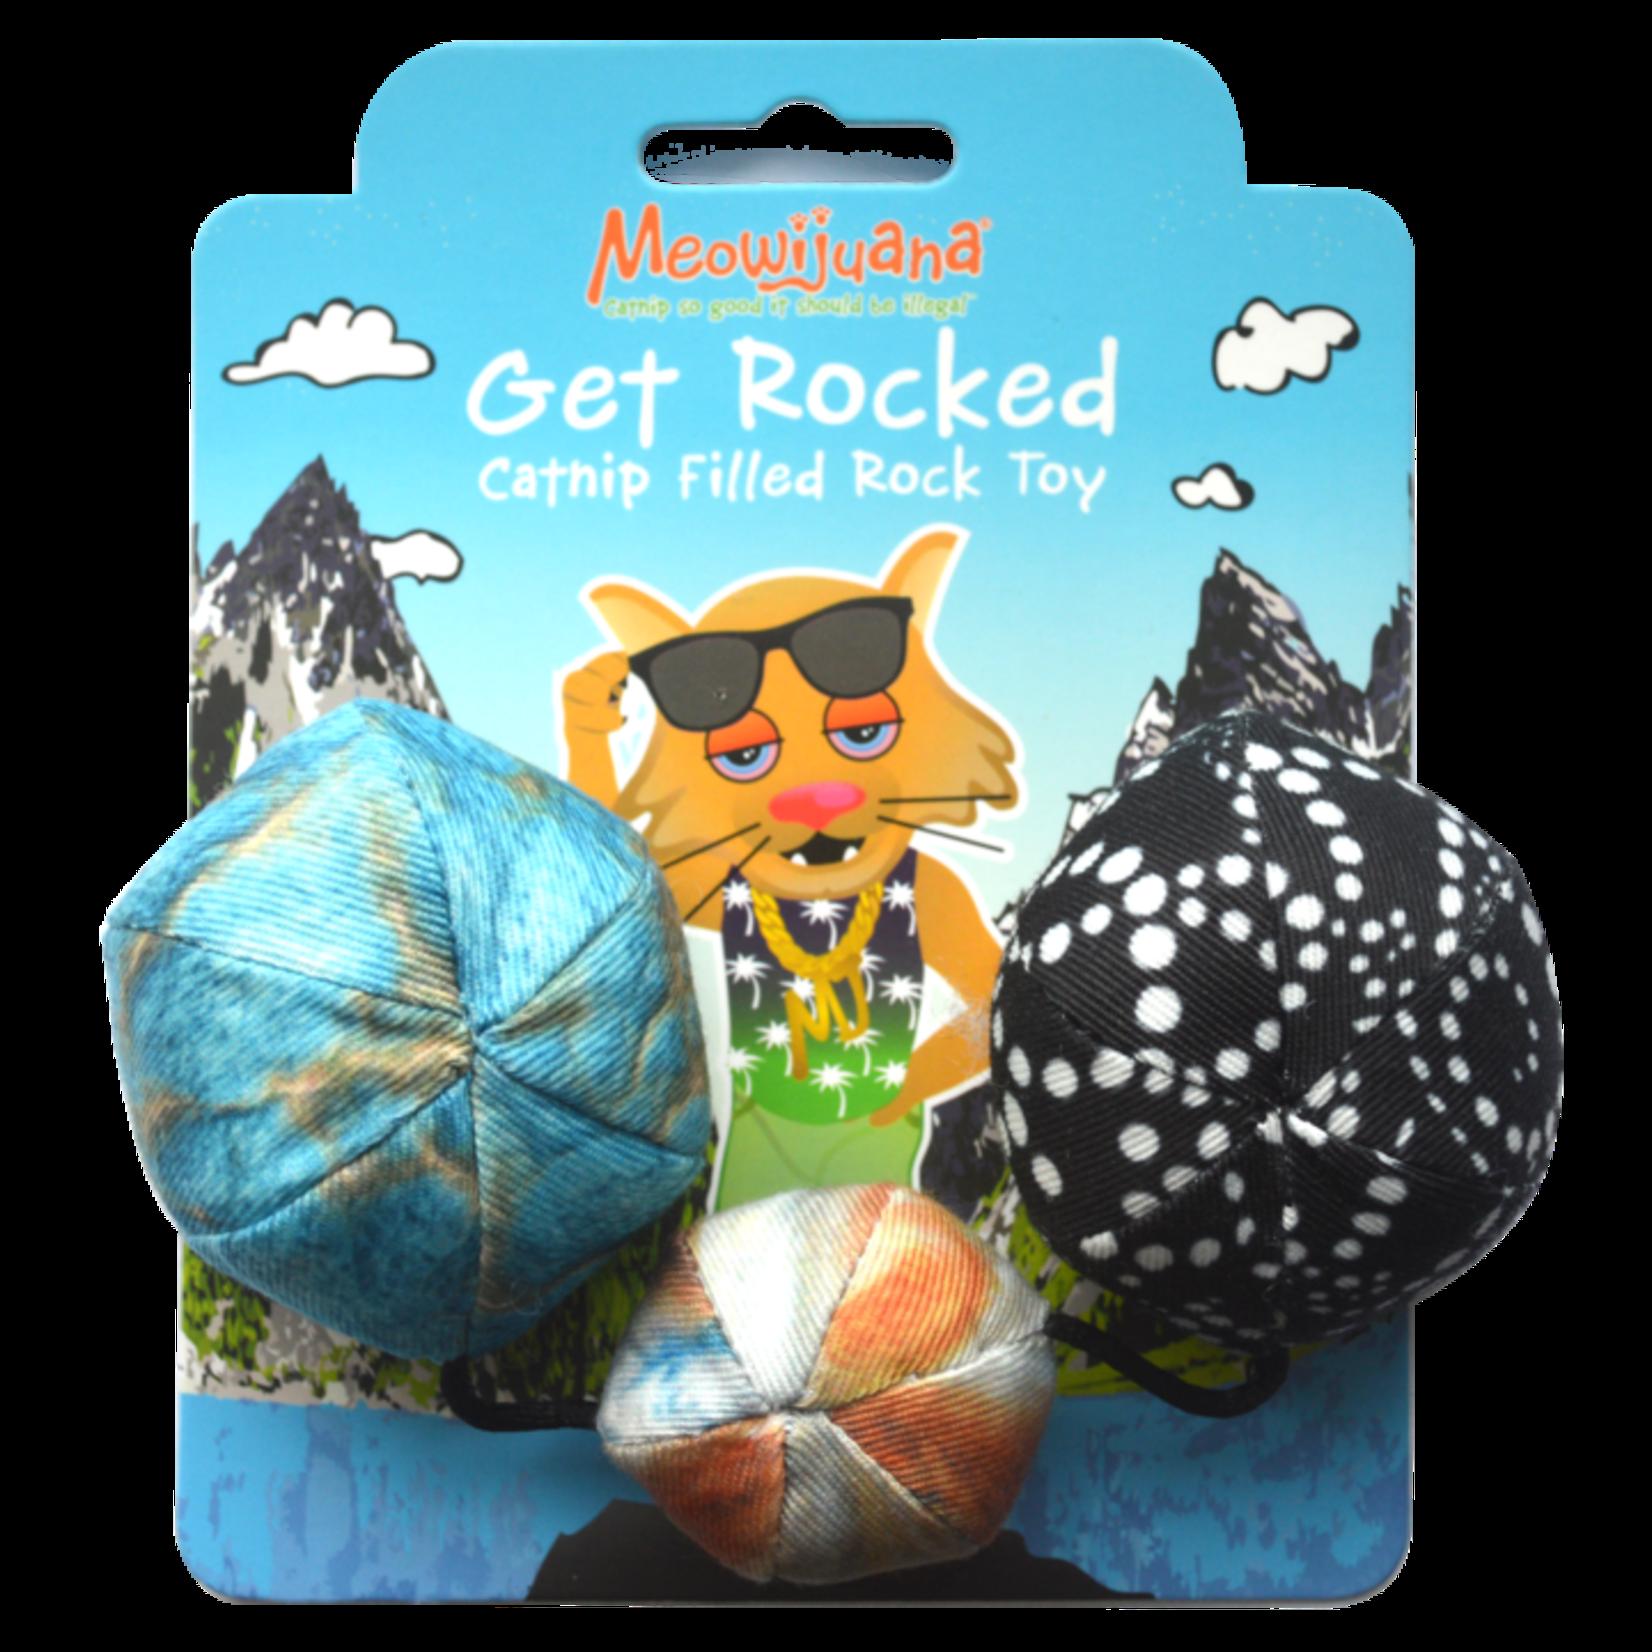 Meowijuana Meowijuana Catnip Get Rocked String of Stones